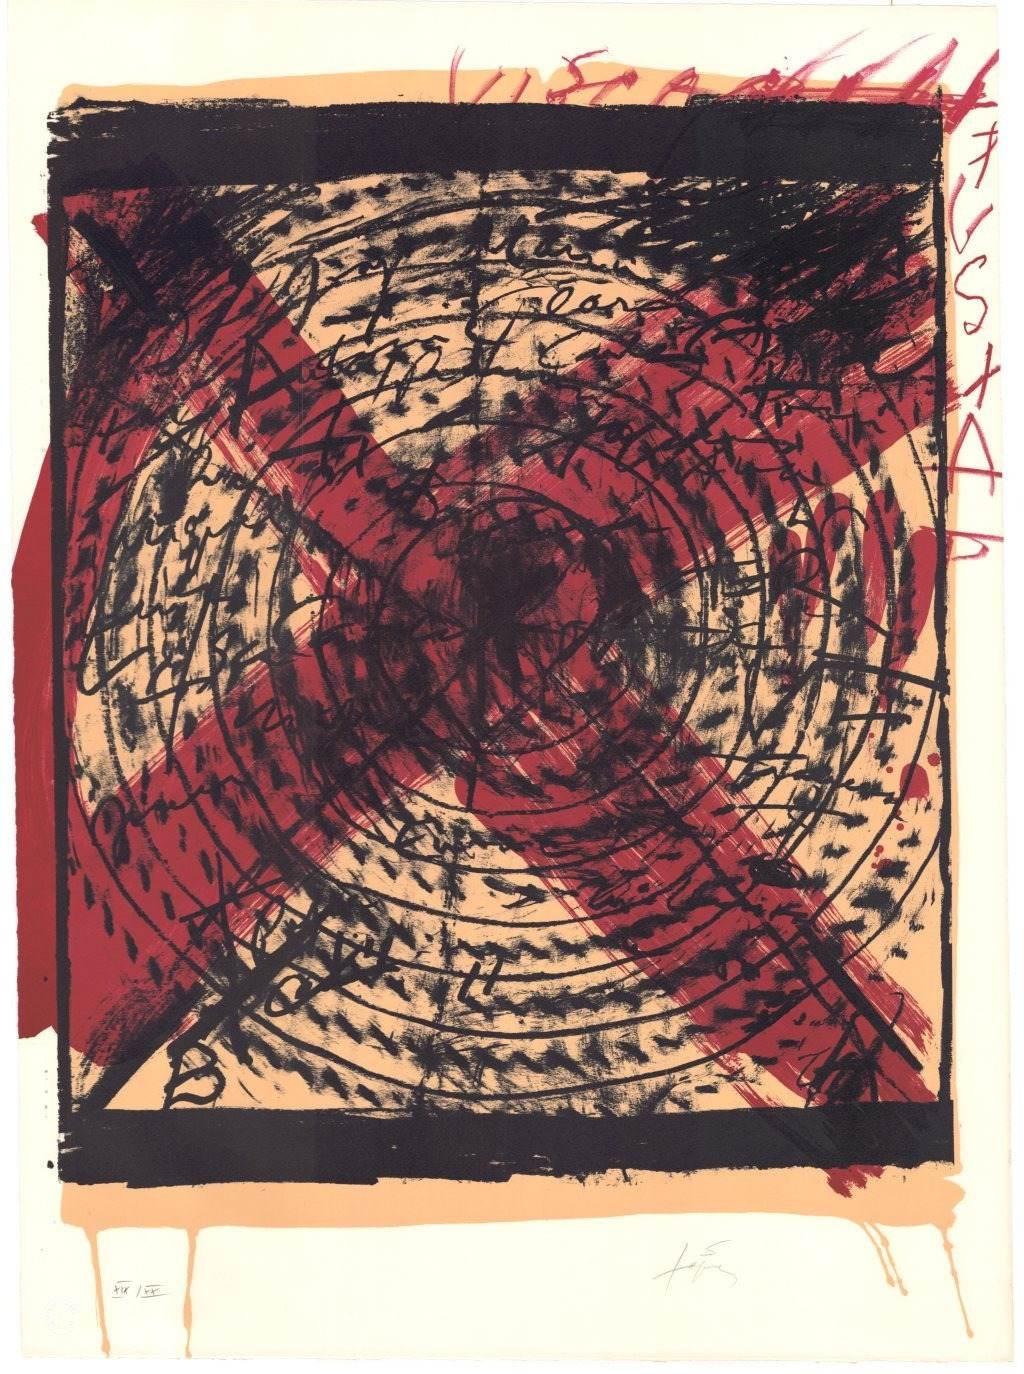 Antonie Tàpies   Diana . 1973 Farblithografie . Auflage XX . 75 x 56 cm  2.200 Euro